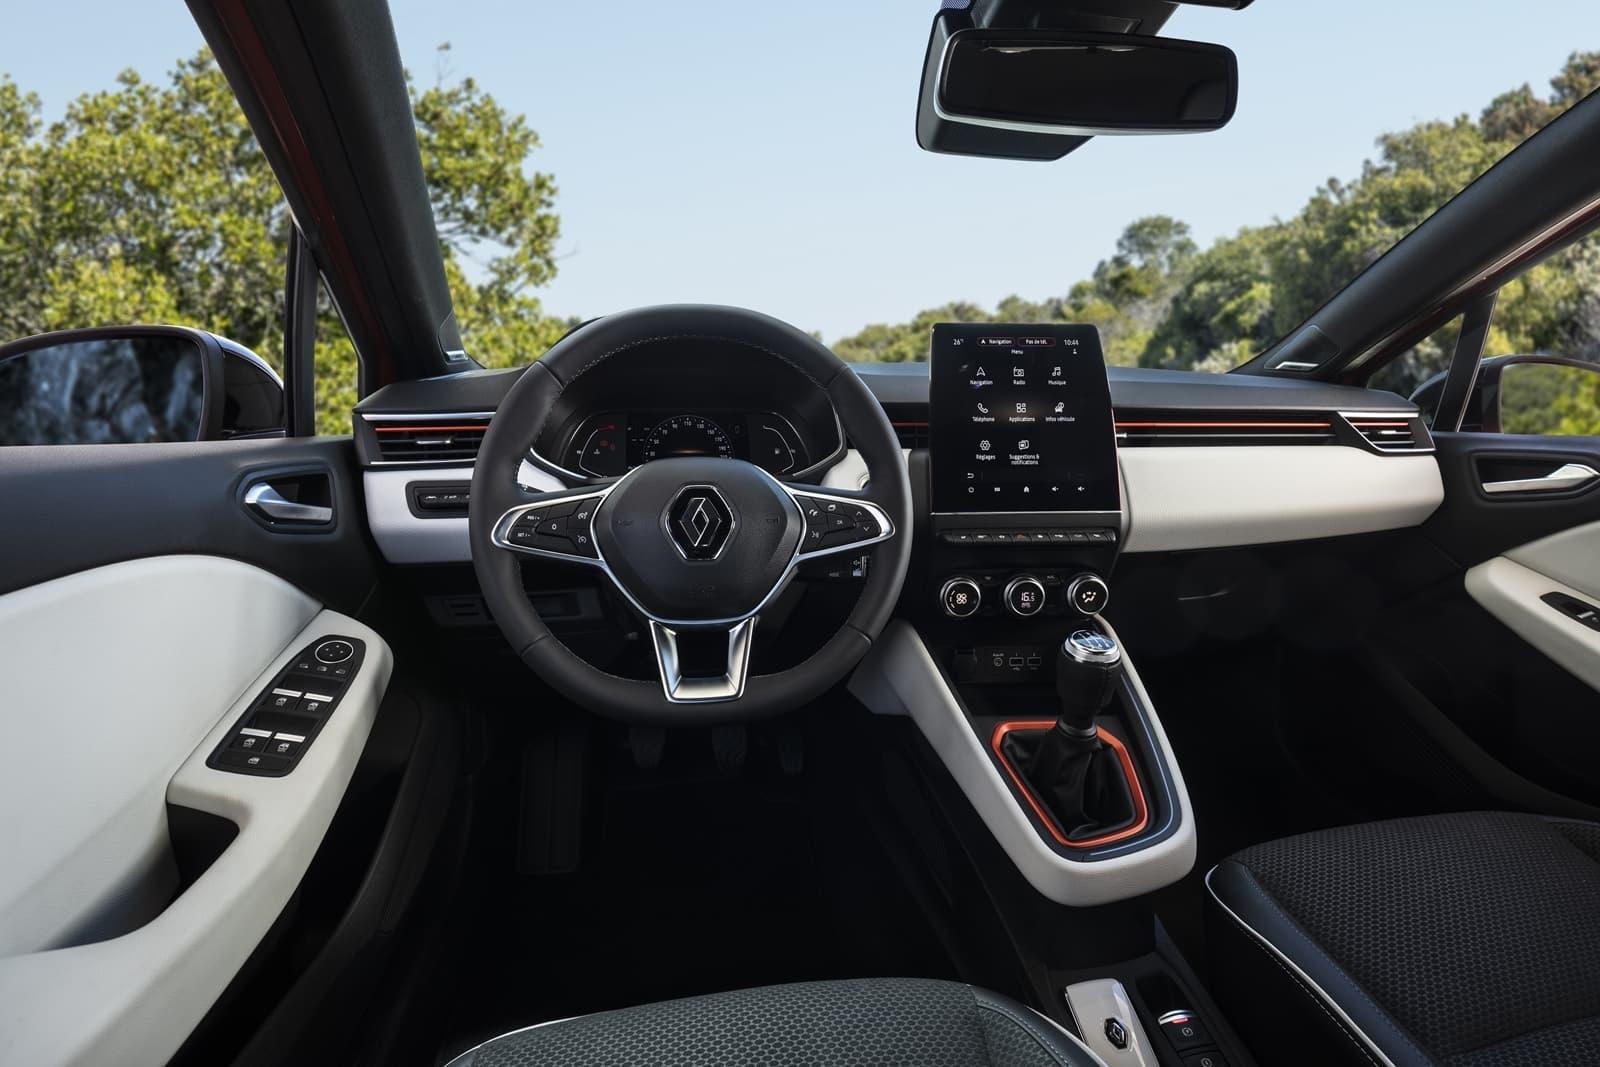 Renault Clio 2020 Prueba 0619 021